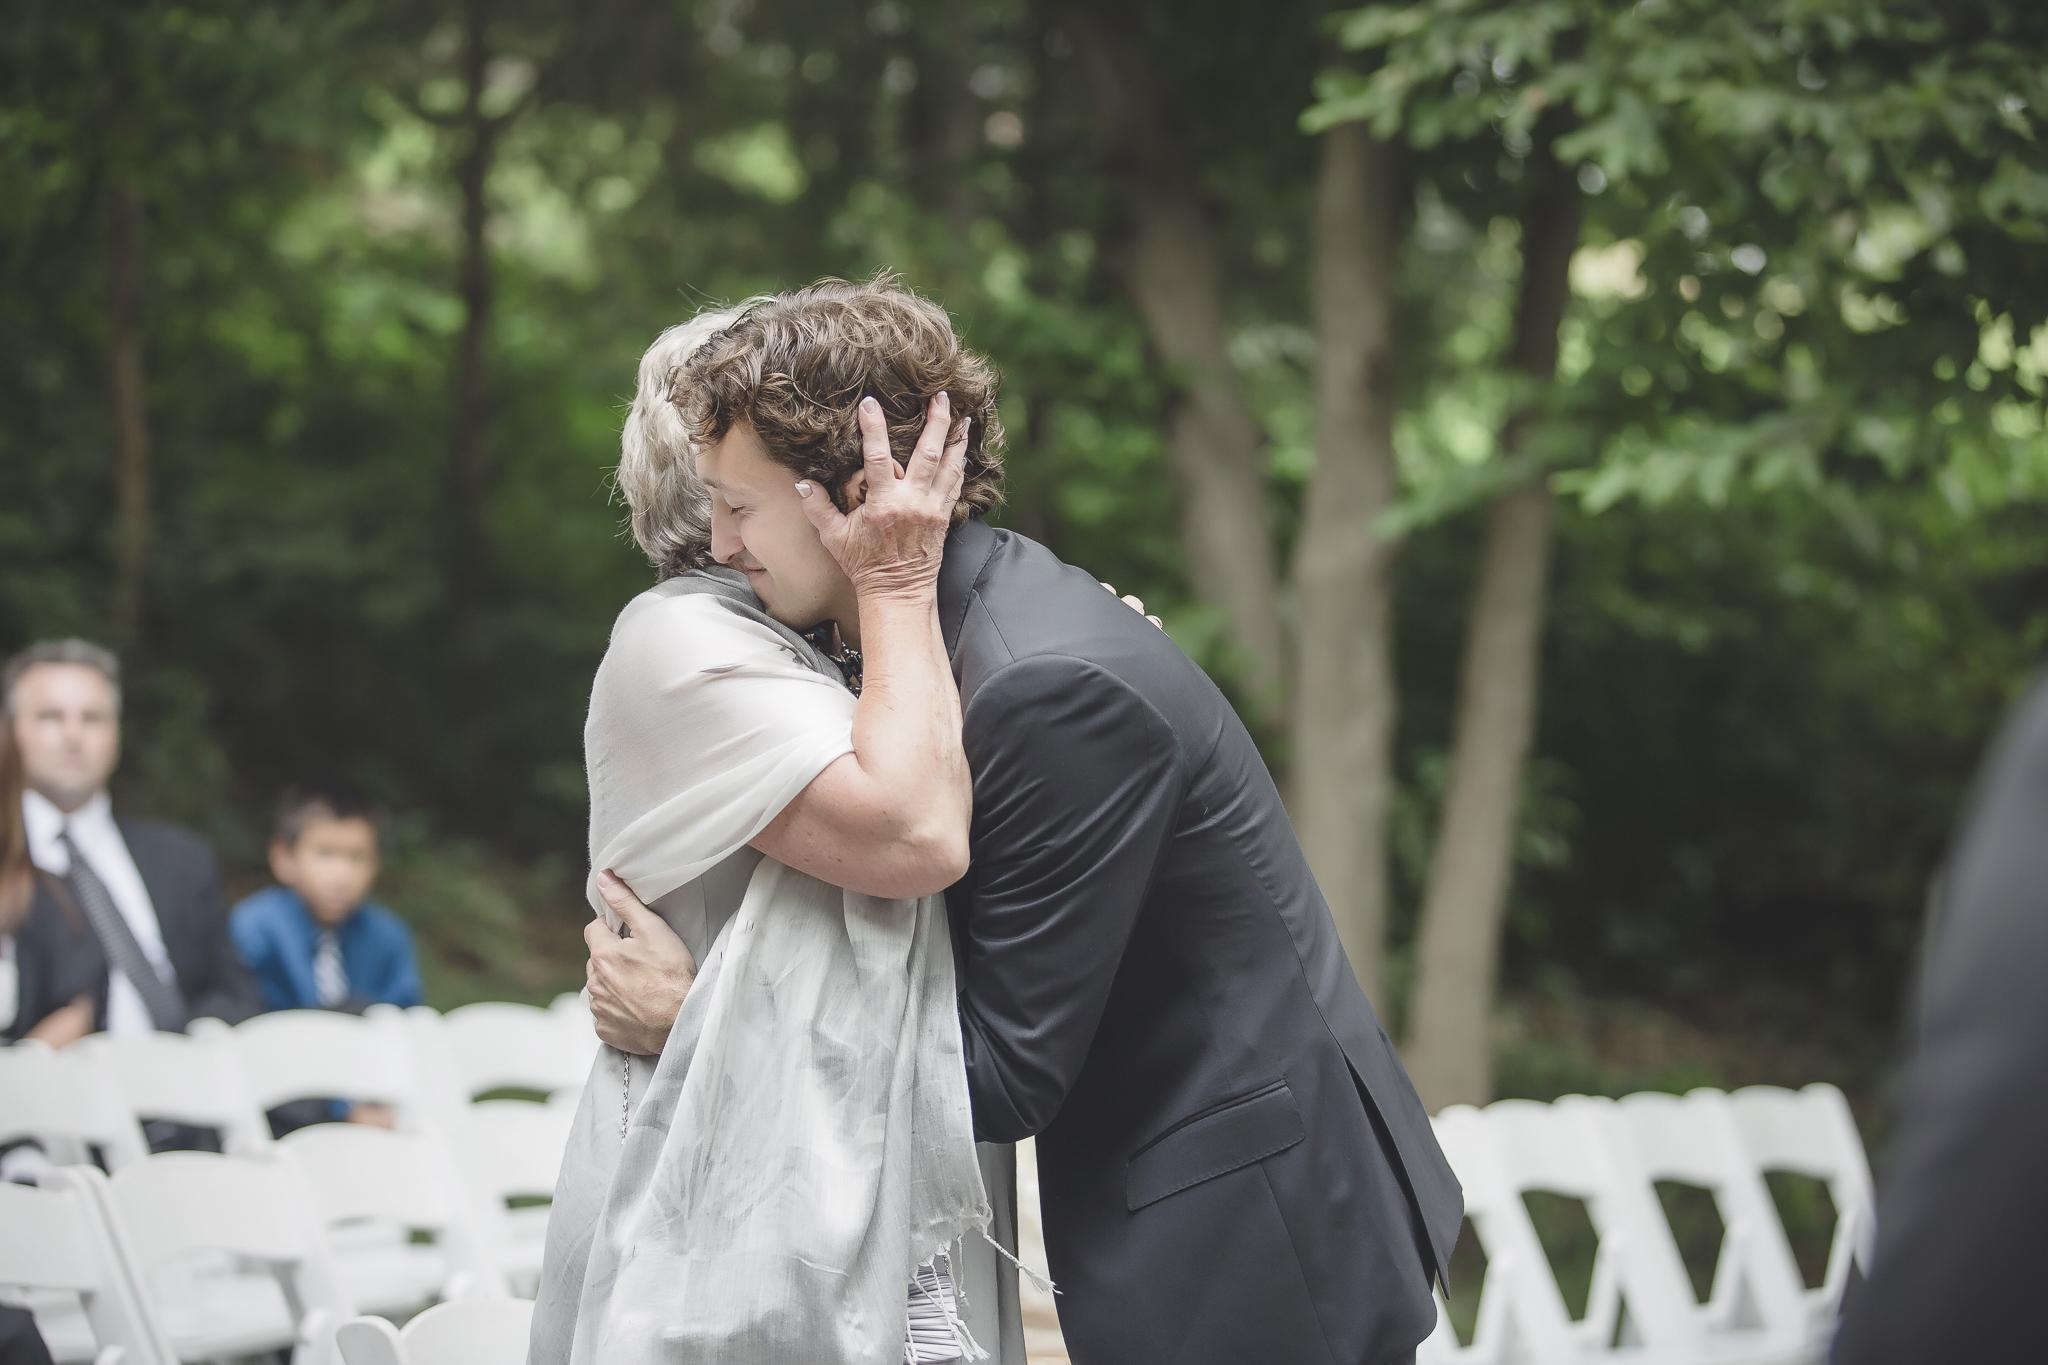 james j hill library wedding photography-9.jpg